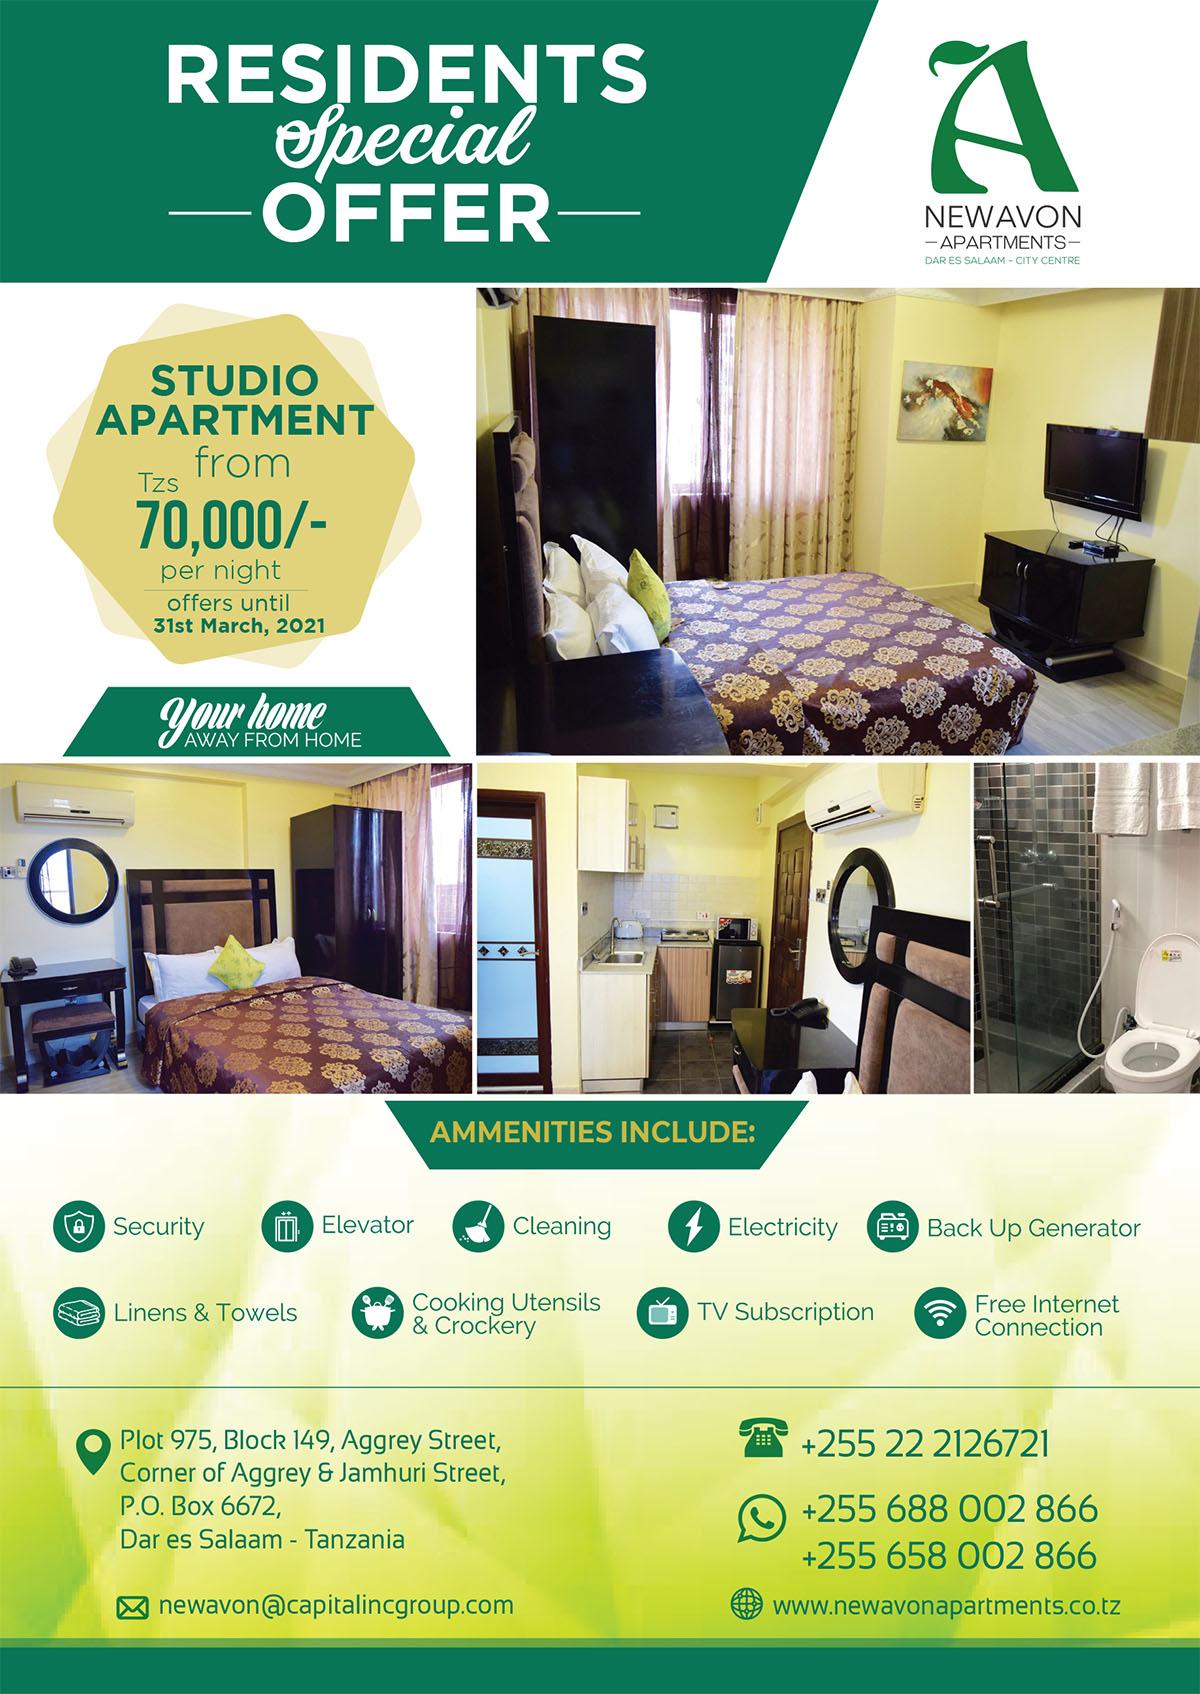 New-Avon-Apartments-Studio-Apartment-Residents-Offer